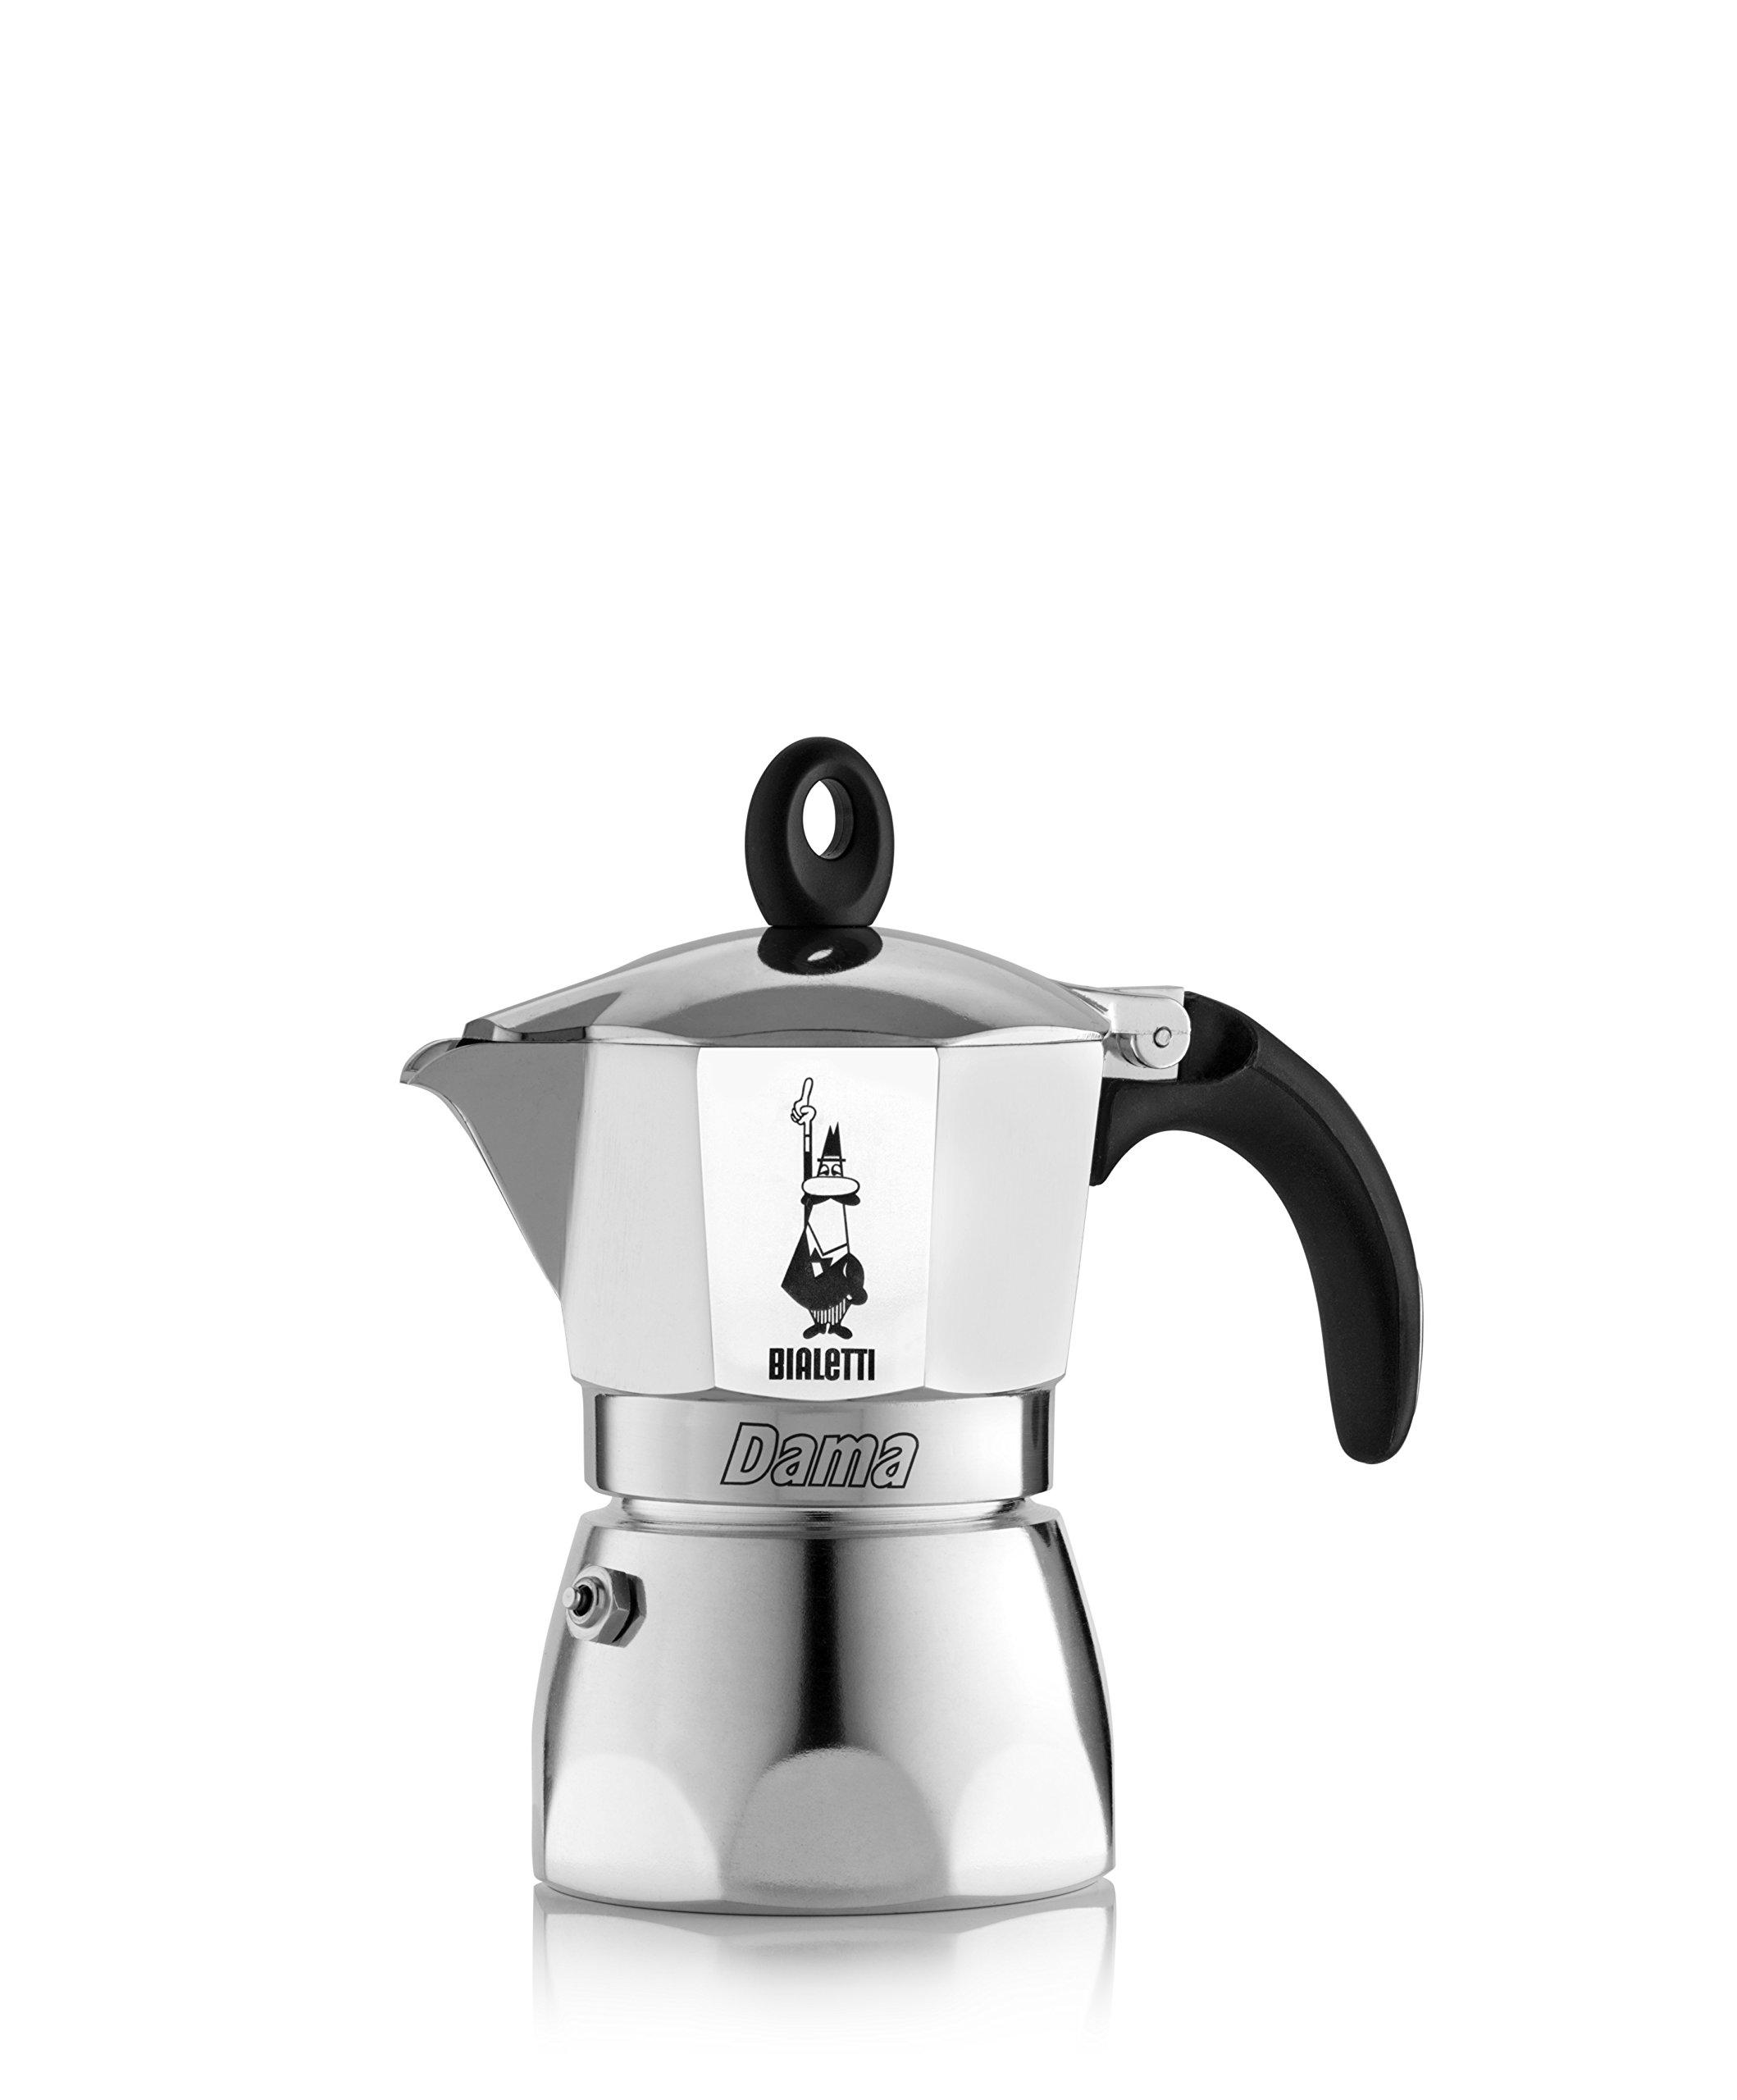 Bialetti: ''Dama'' Stovetop Coffee Maker 9-Cups [ Italian Import ]